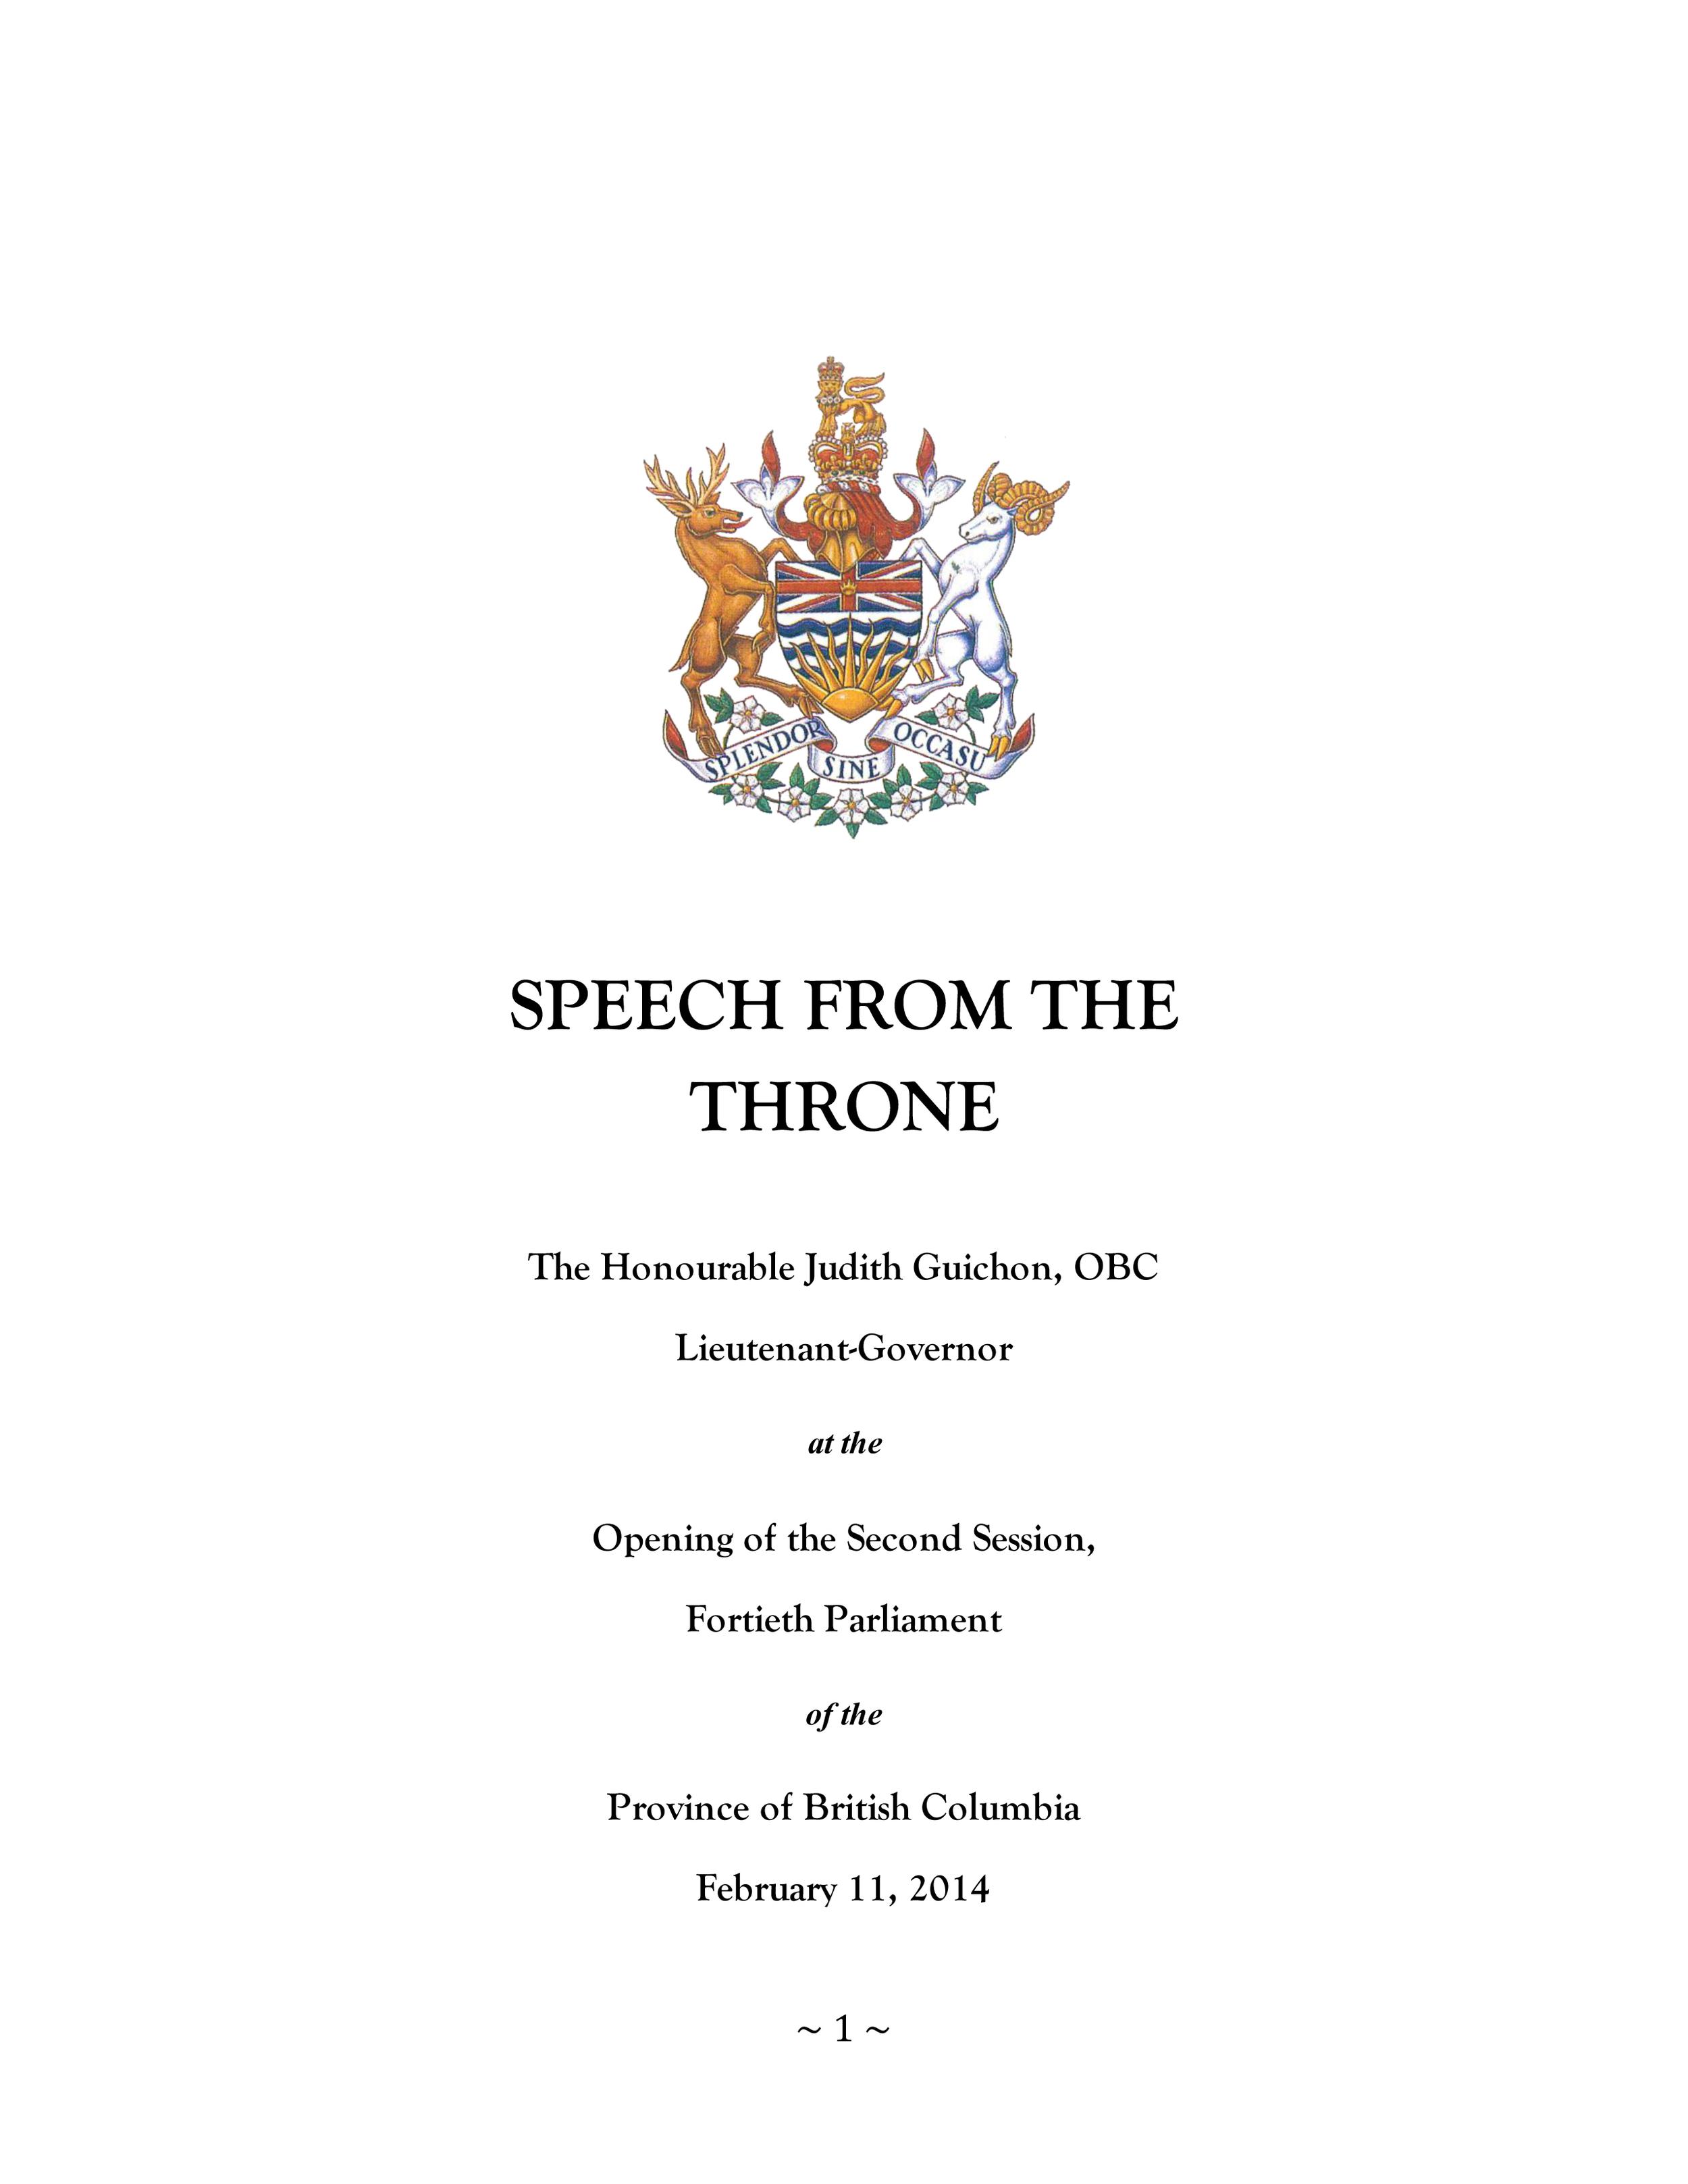 Speech from the Throne 2014-1.jpg